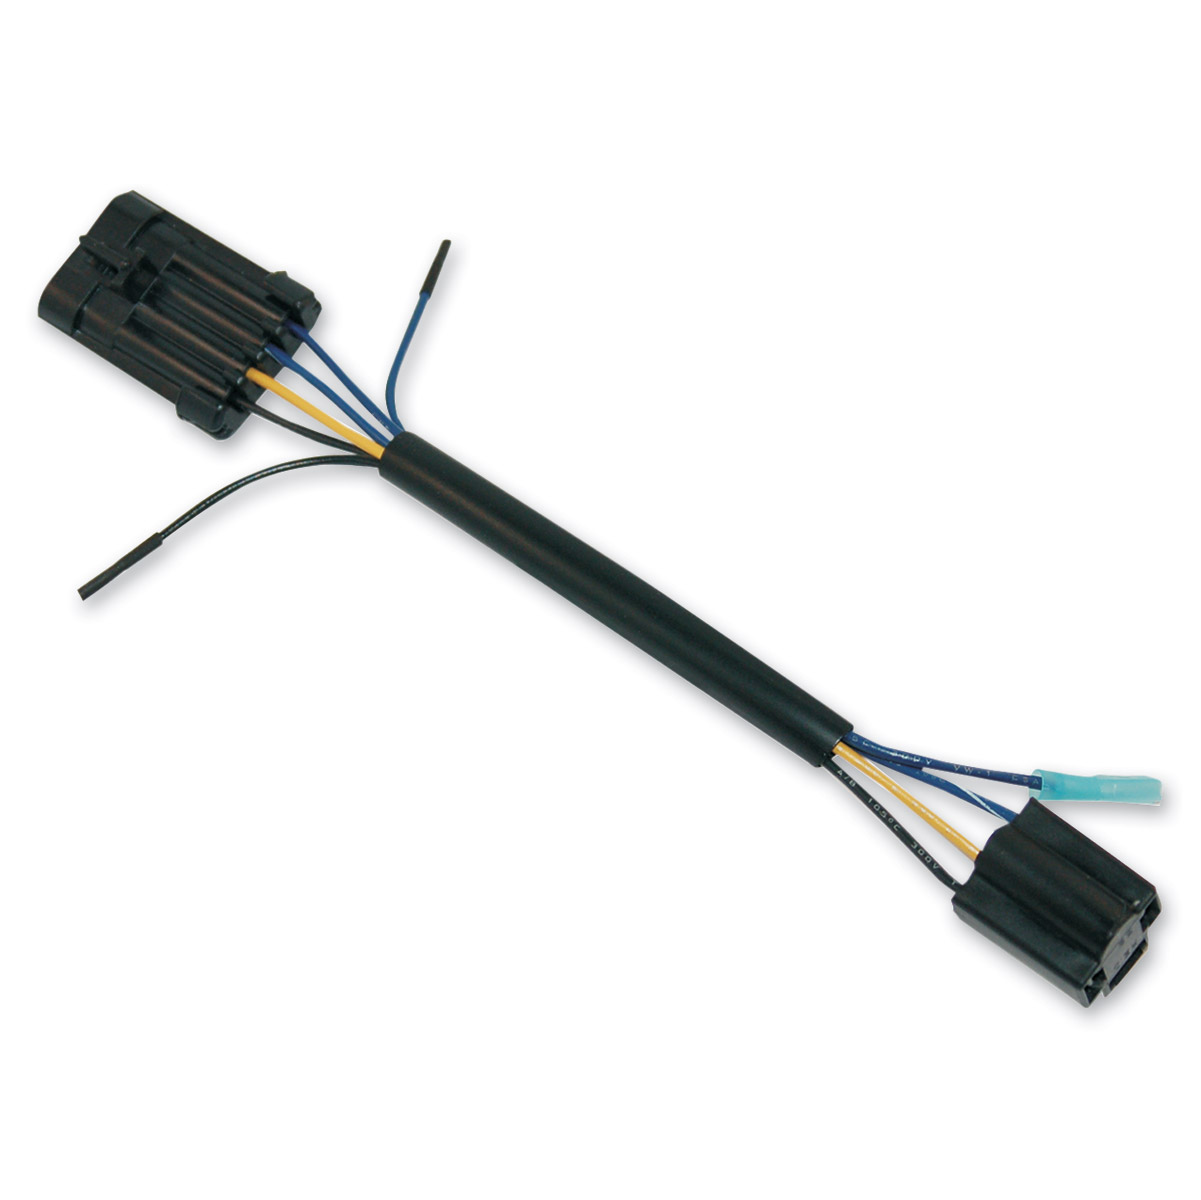 Kuryakyn Headlamp Adapter Harness